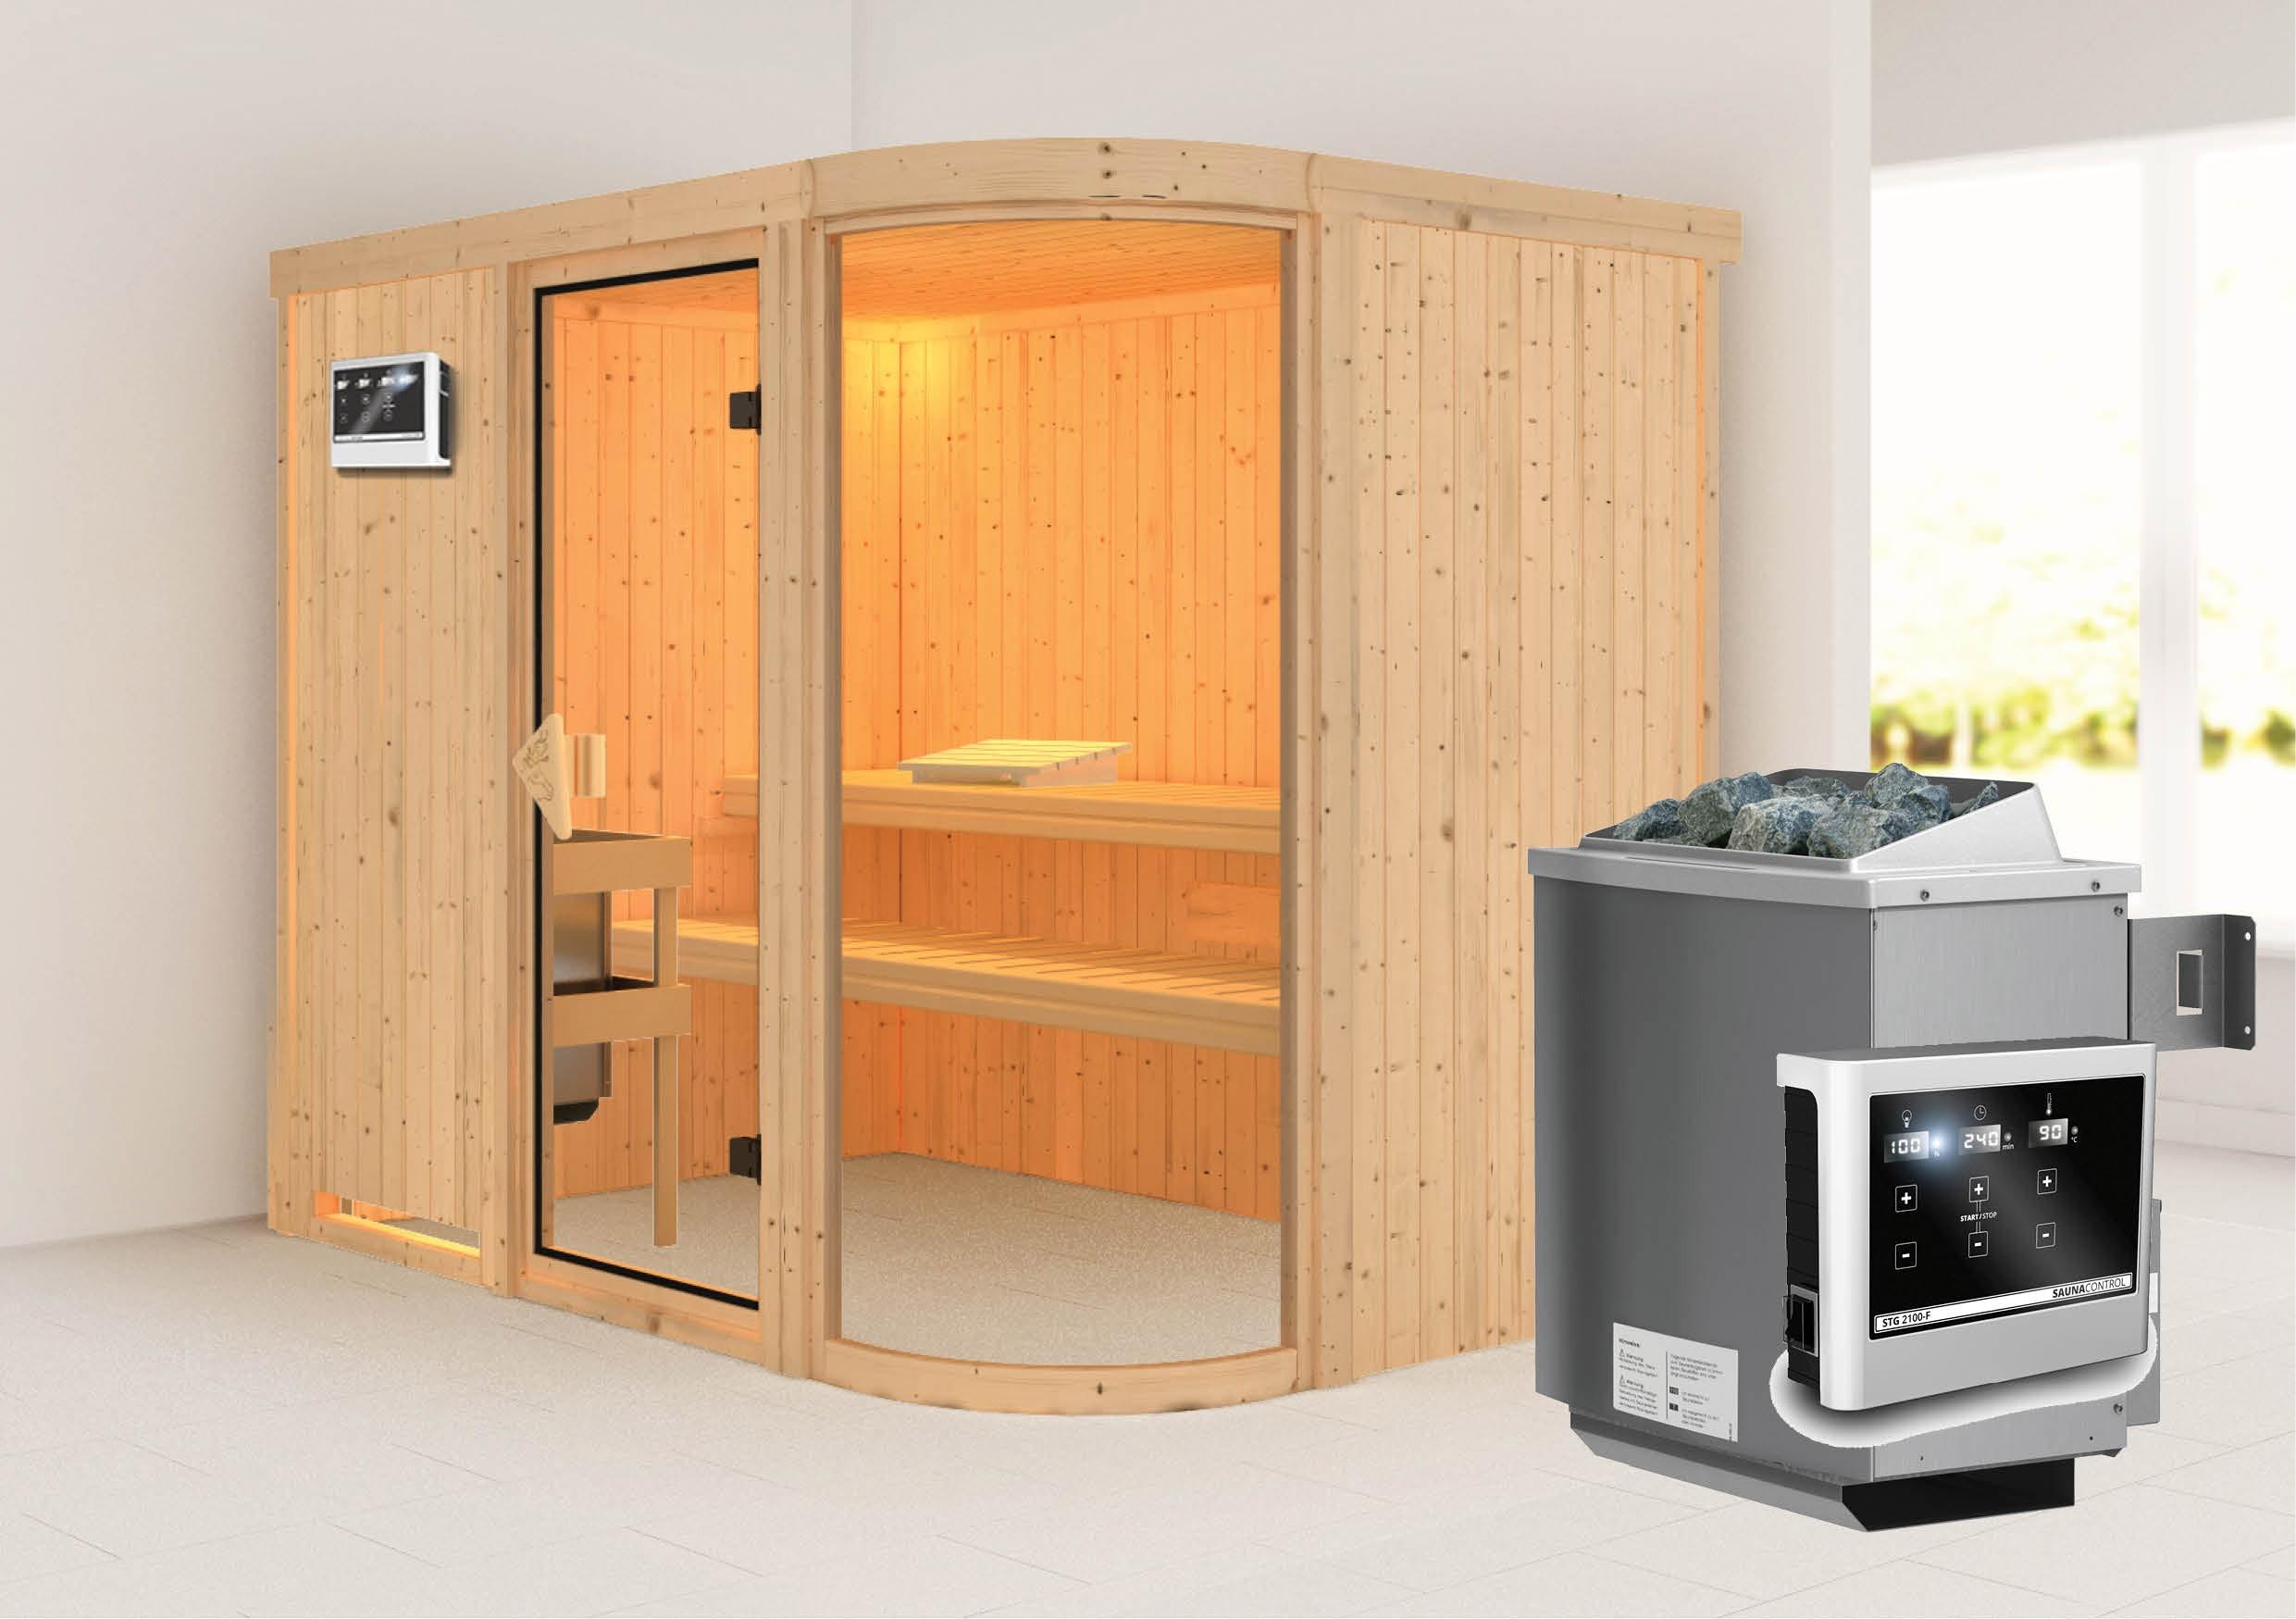 Karibu Sauna Parima 4 68mm mit Ofen 9kW extern classic Tür Bild 1